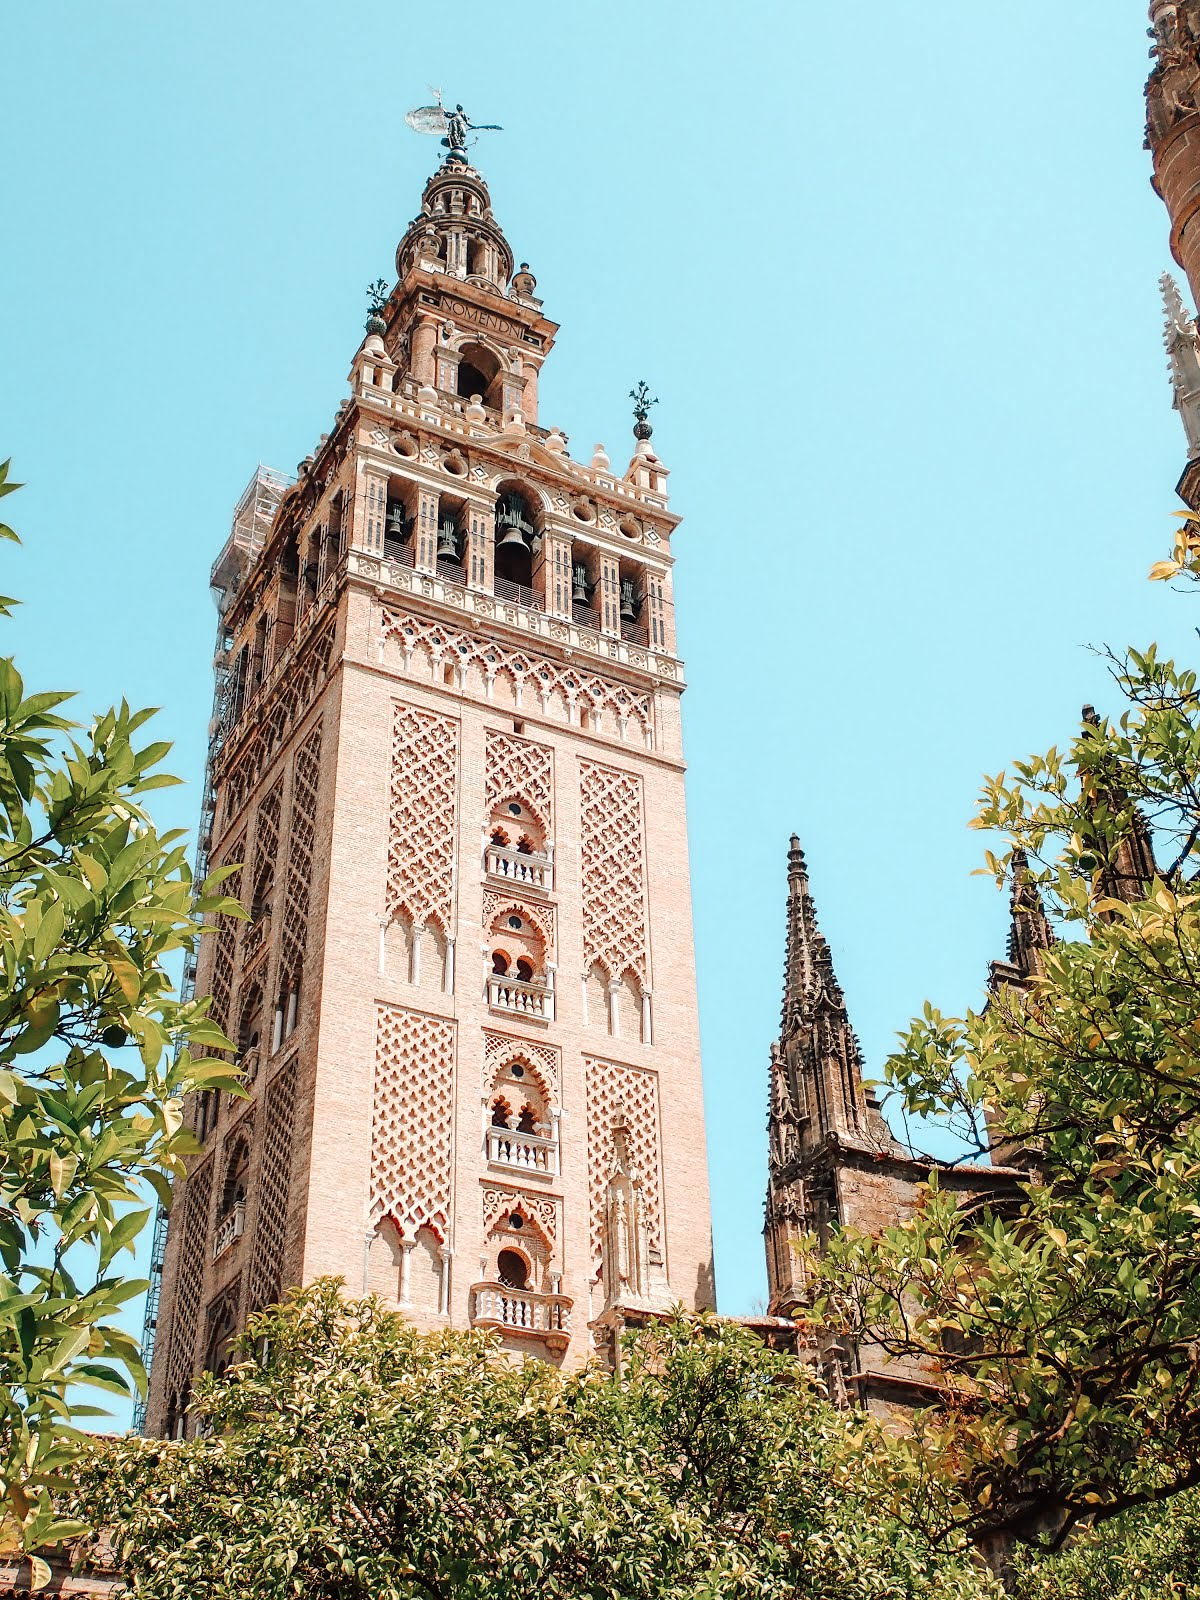 giralda-séville-minaret-clocher-architecture-chrétienne-islamique